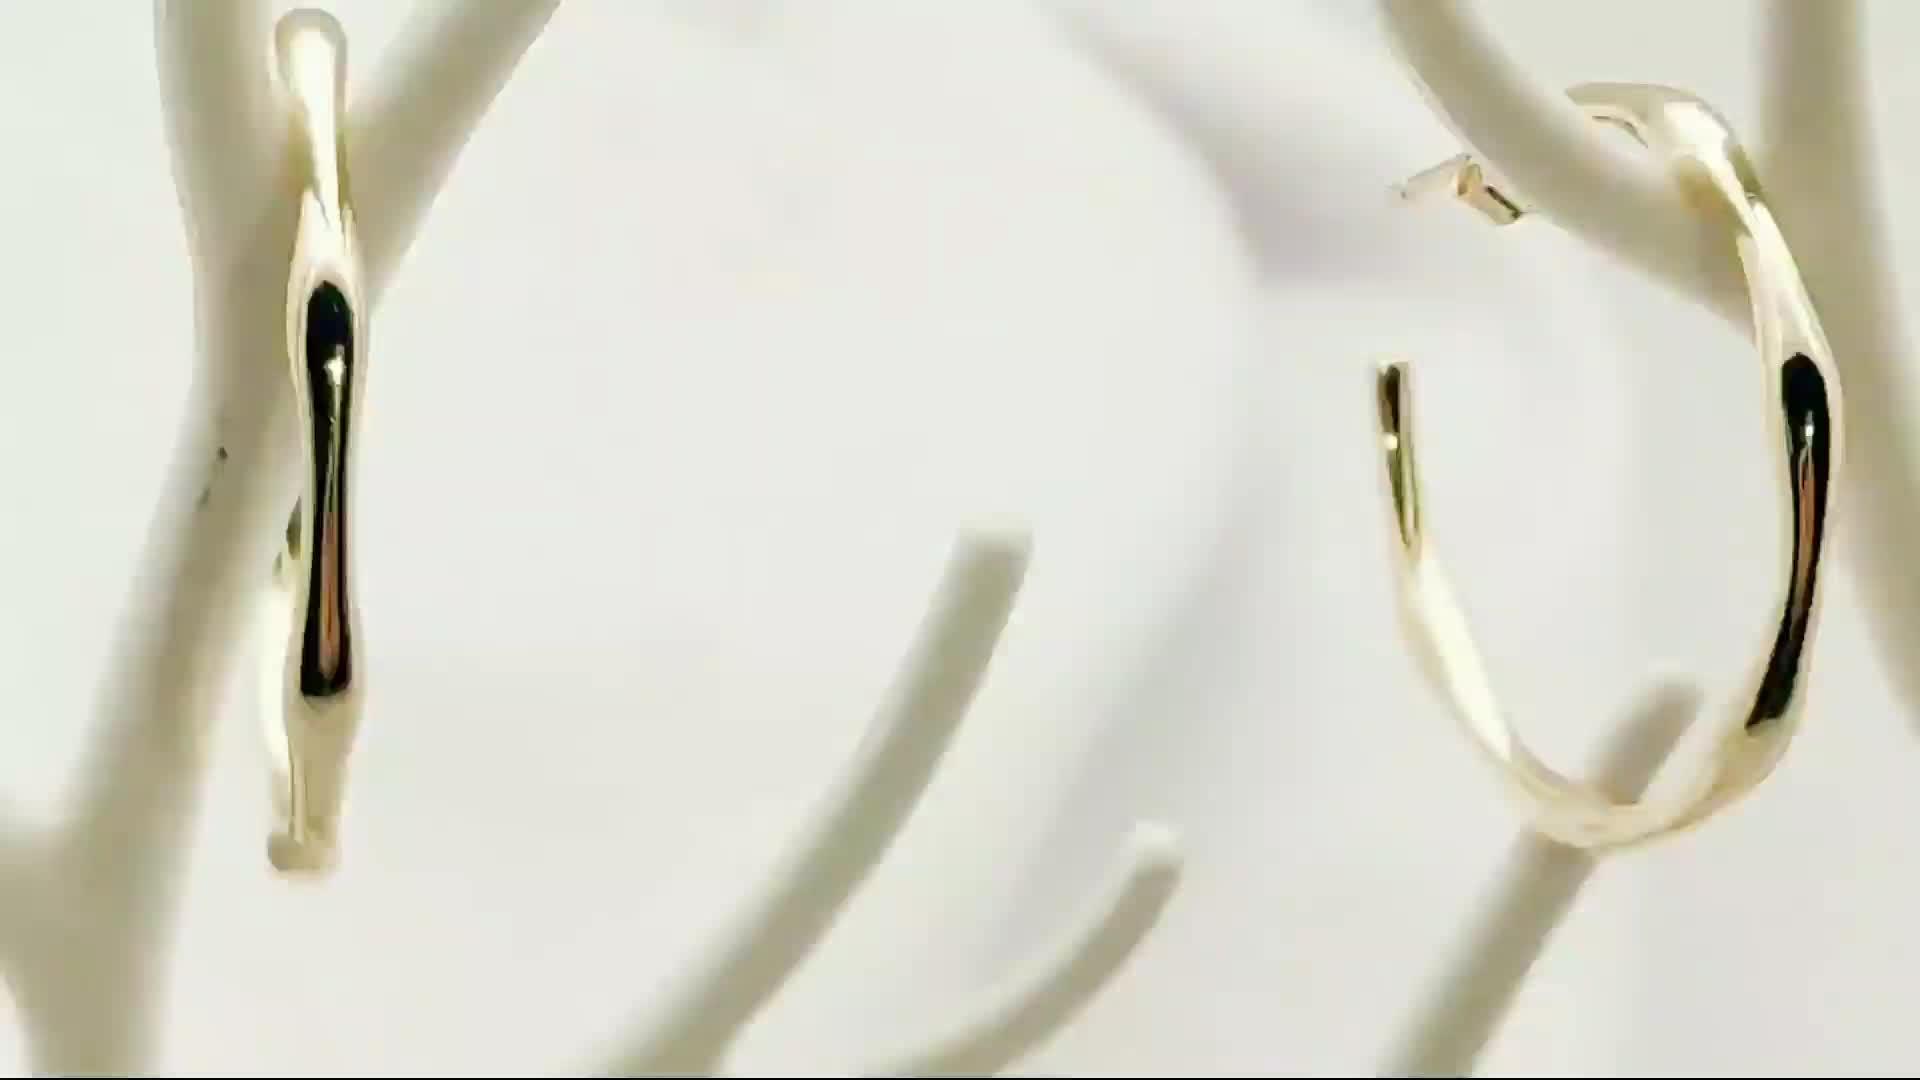 2019 daily สวมใส่เครื่องประดับ minimalist แฟชั่น 18 k gold ต่างหู big hoop